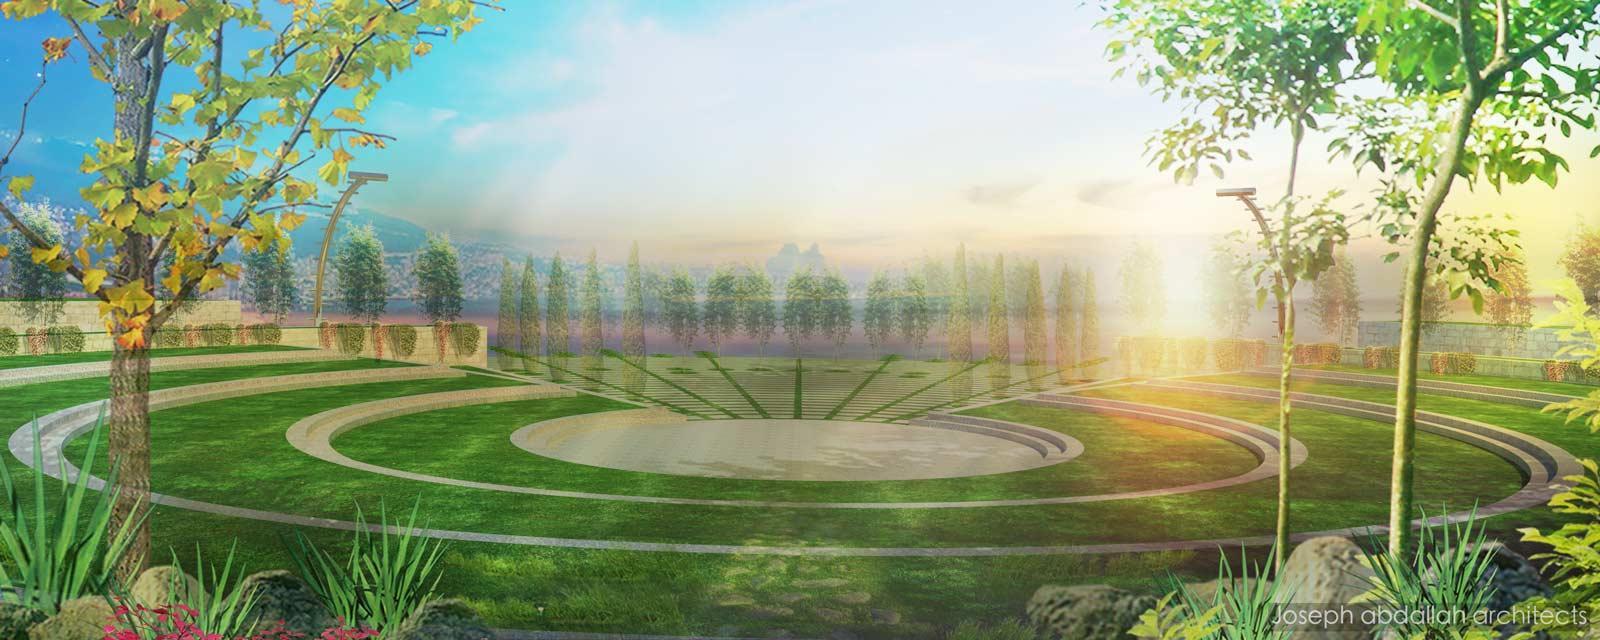 chbat-venue-wedding-garden-landscape-design-lebanon-joseph-abdallah-architects-1